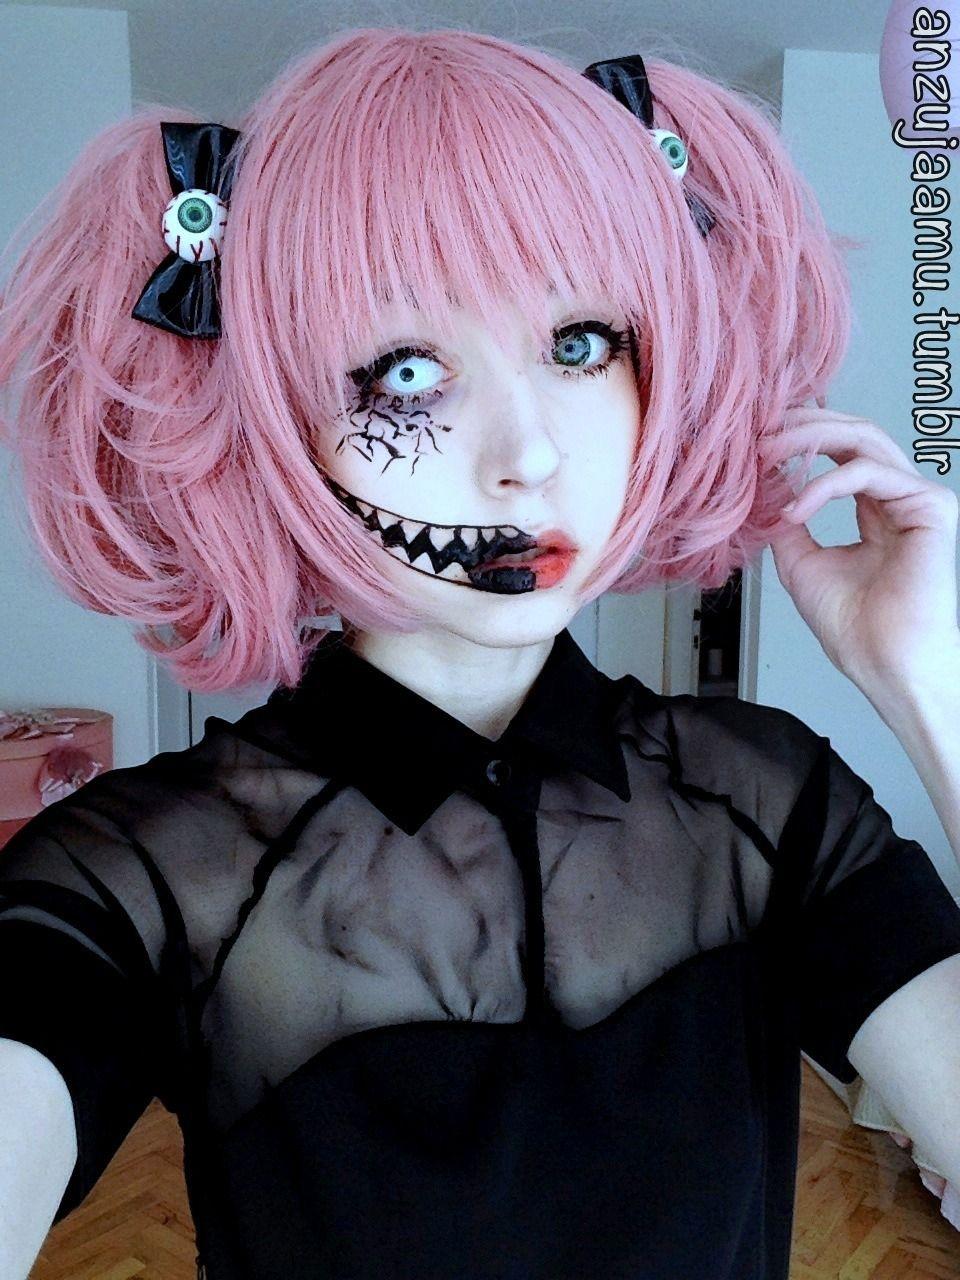 Anime cosplay anime cosplay animes cosplays